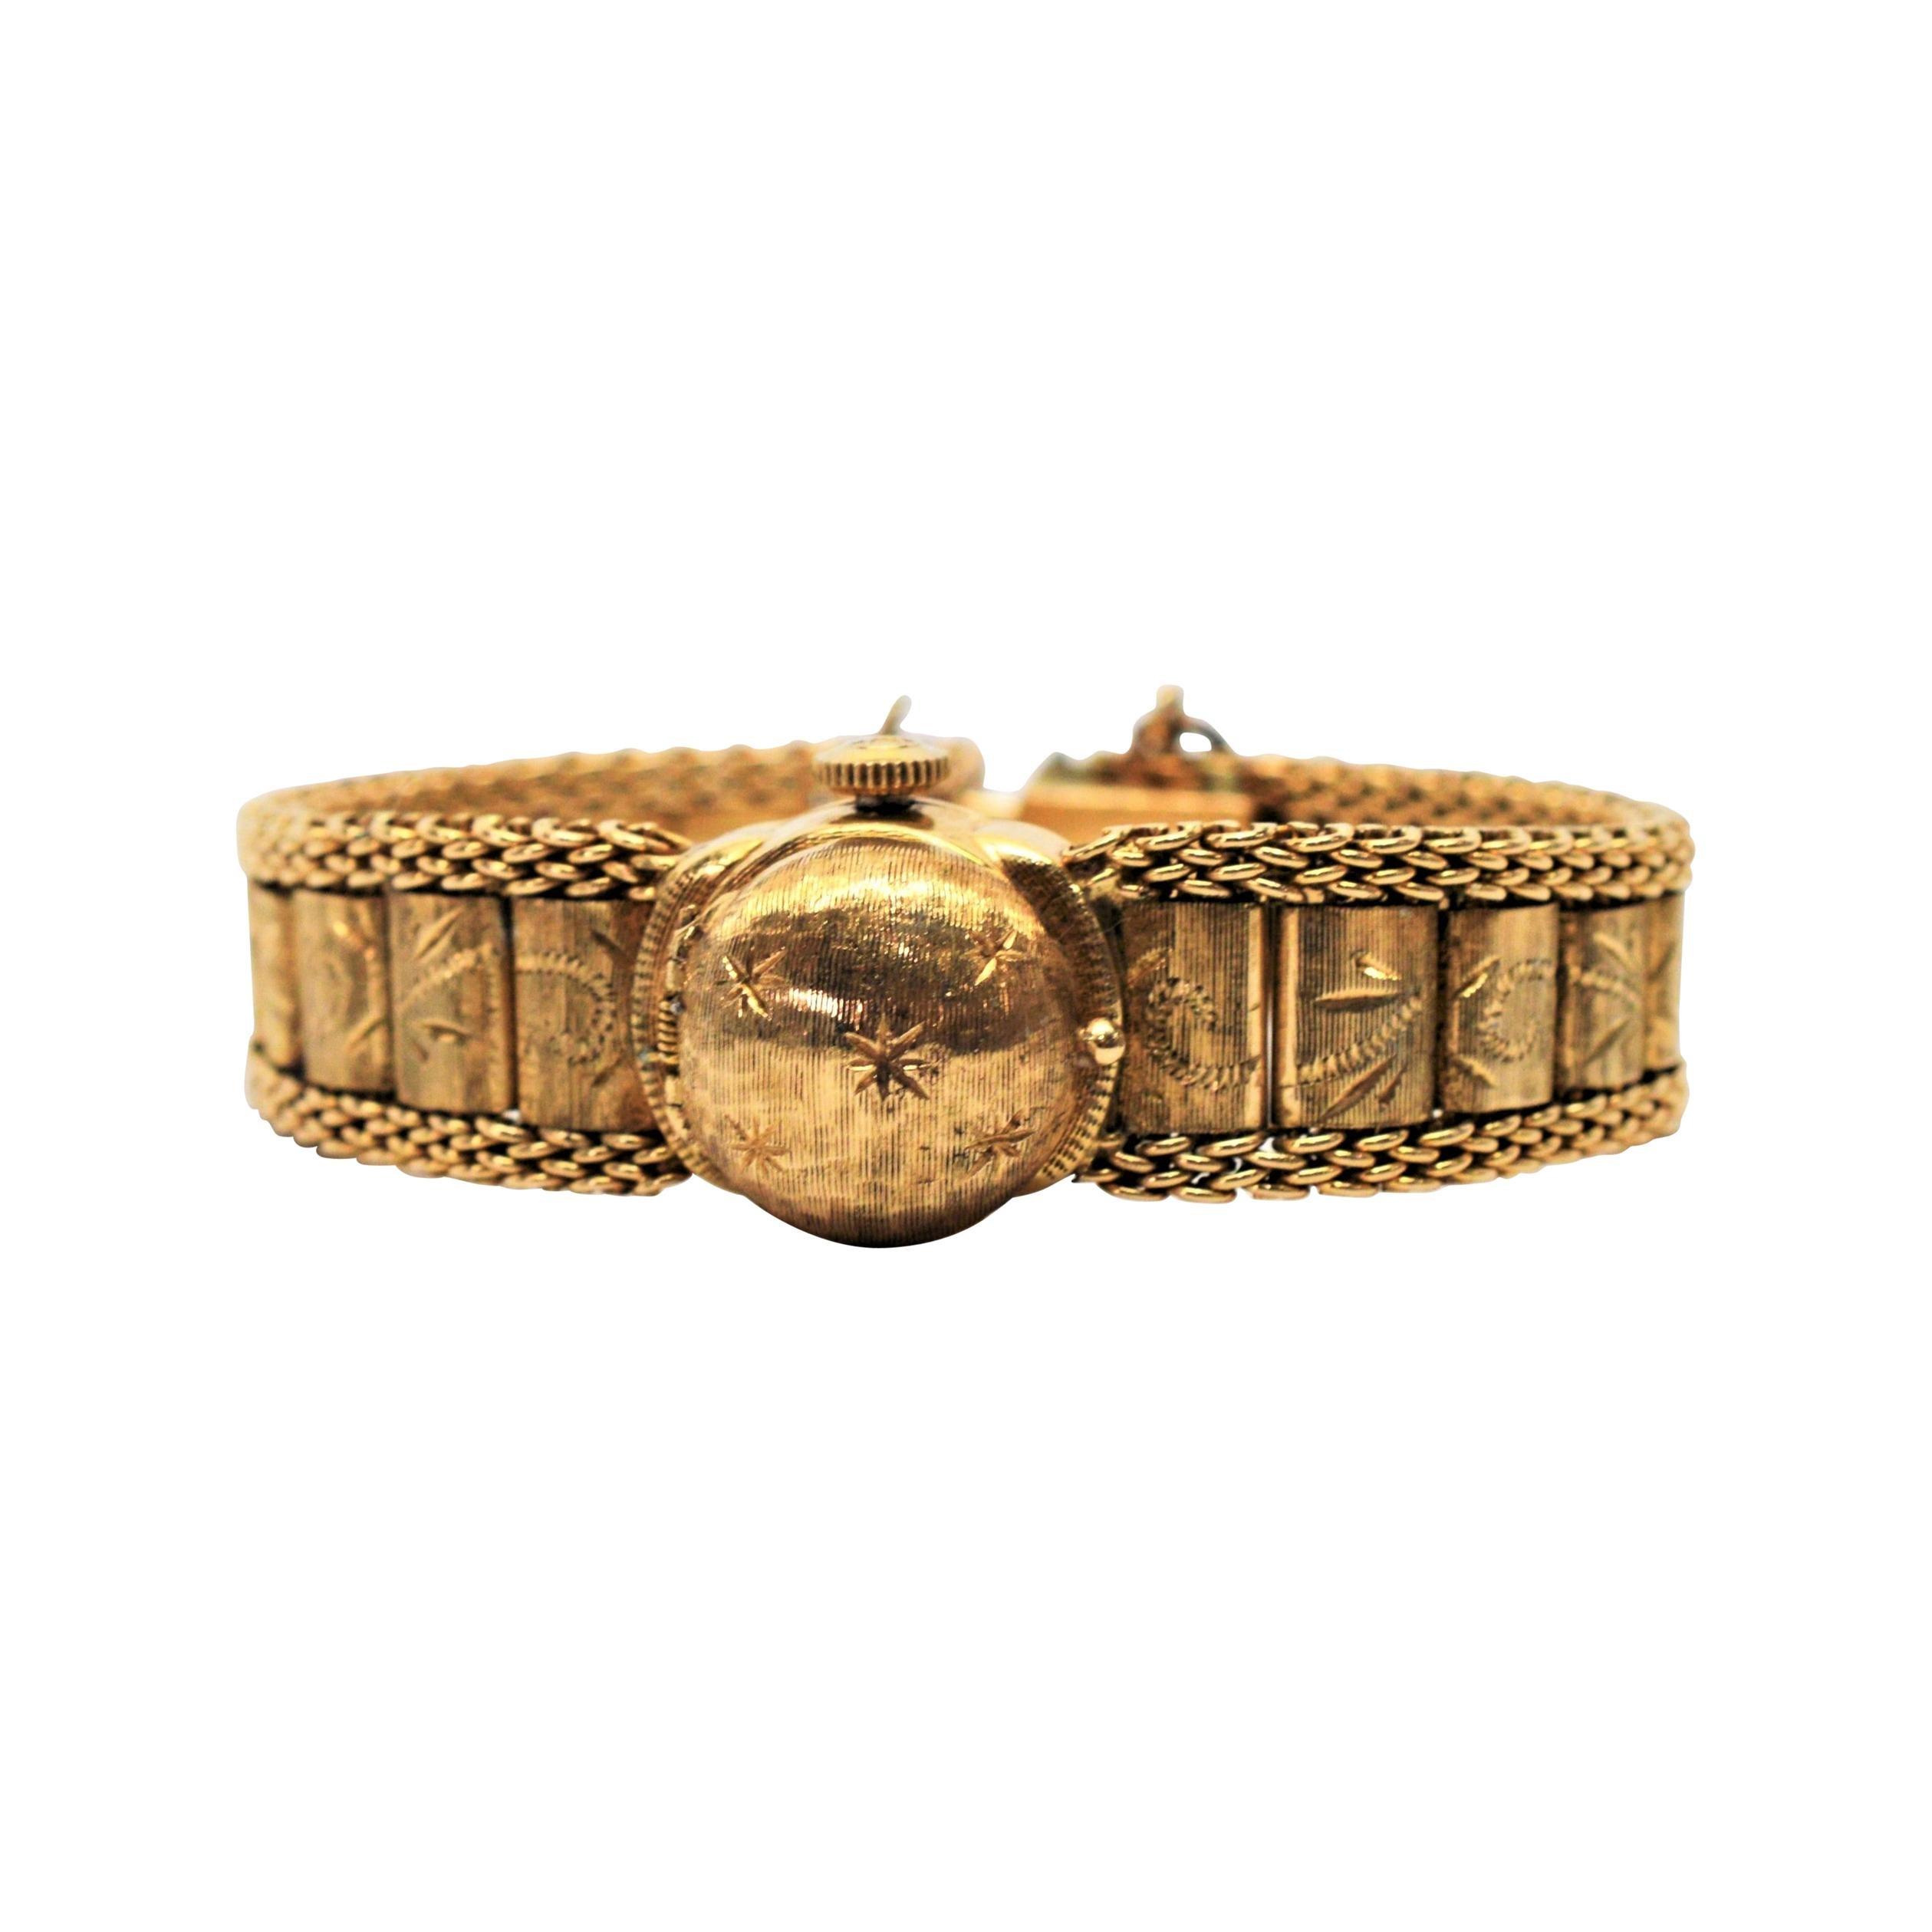 Ladies Antique Engraved Yellow Gold Swiss Watch Bracelet